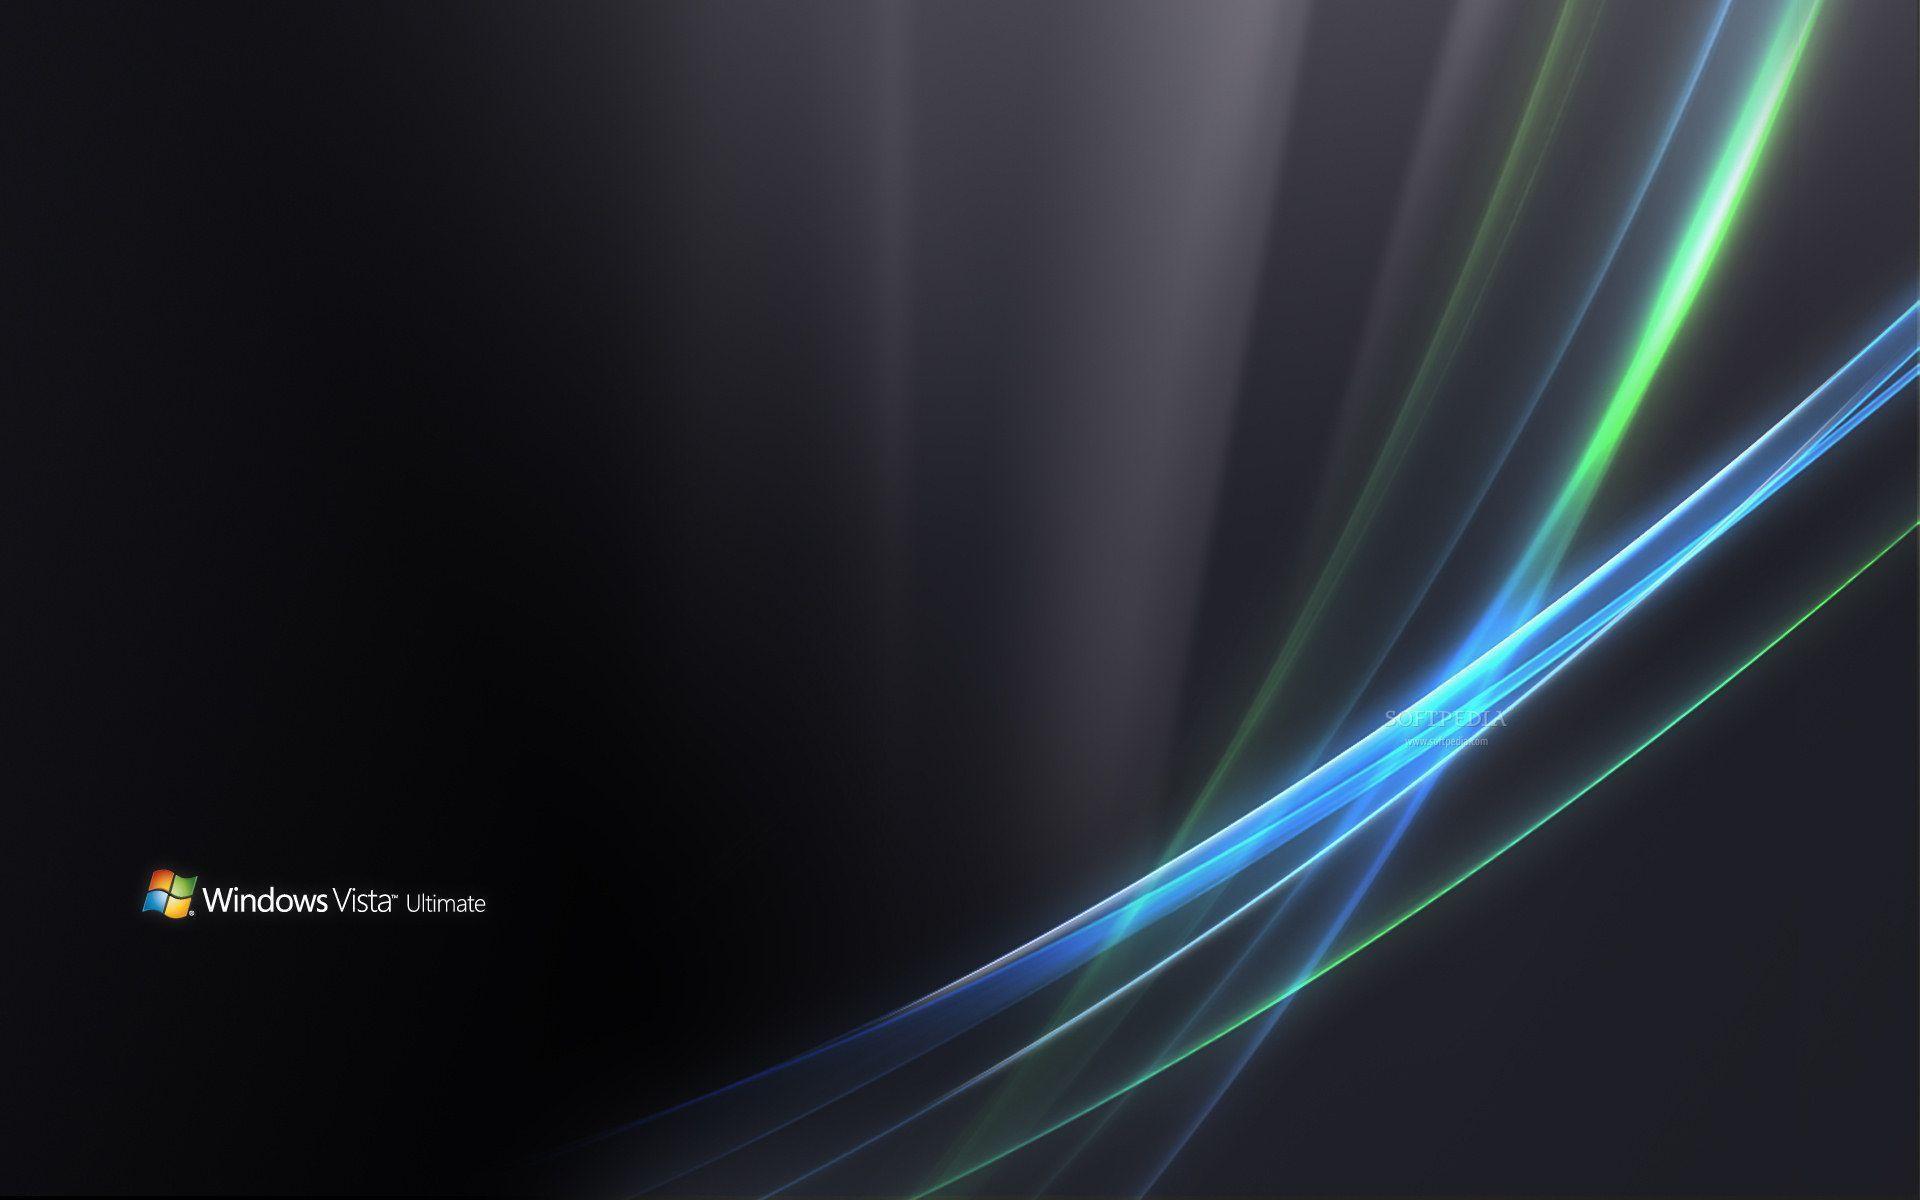 Windows 7 Ultimate Desktop Backgrounds - Wallpaper Cave